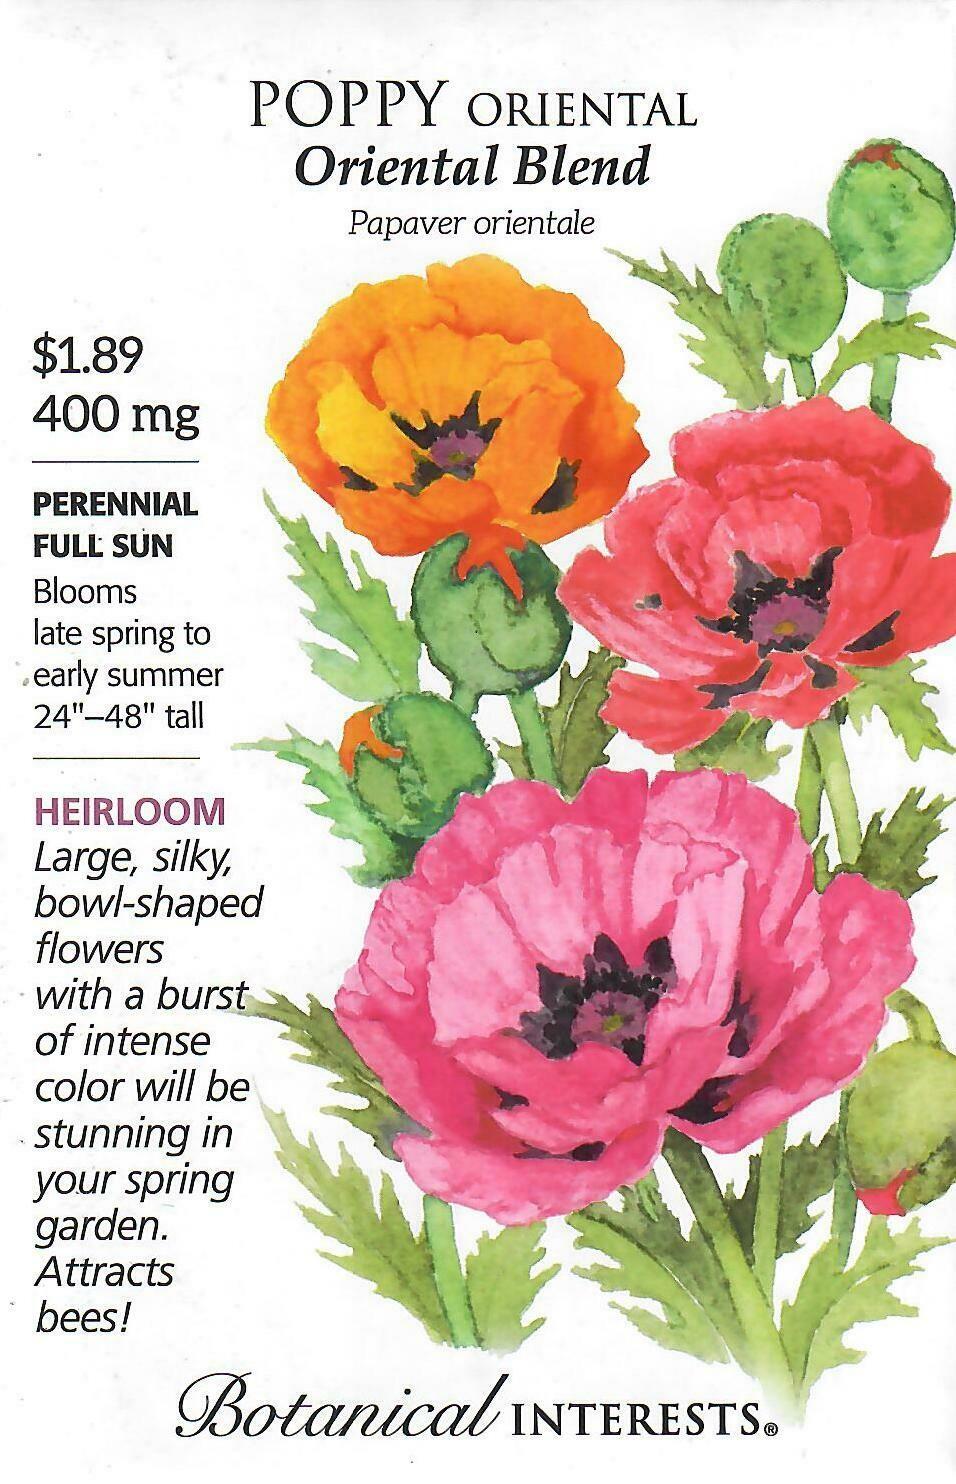 Poppy Oriental Blend Botanical Interests